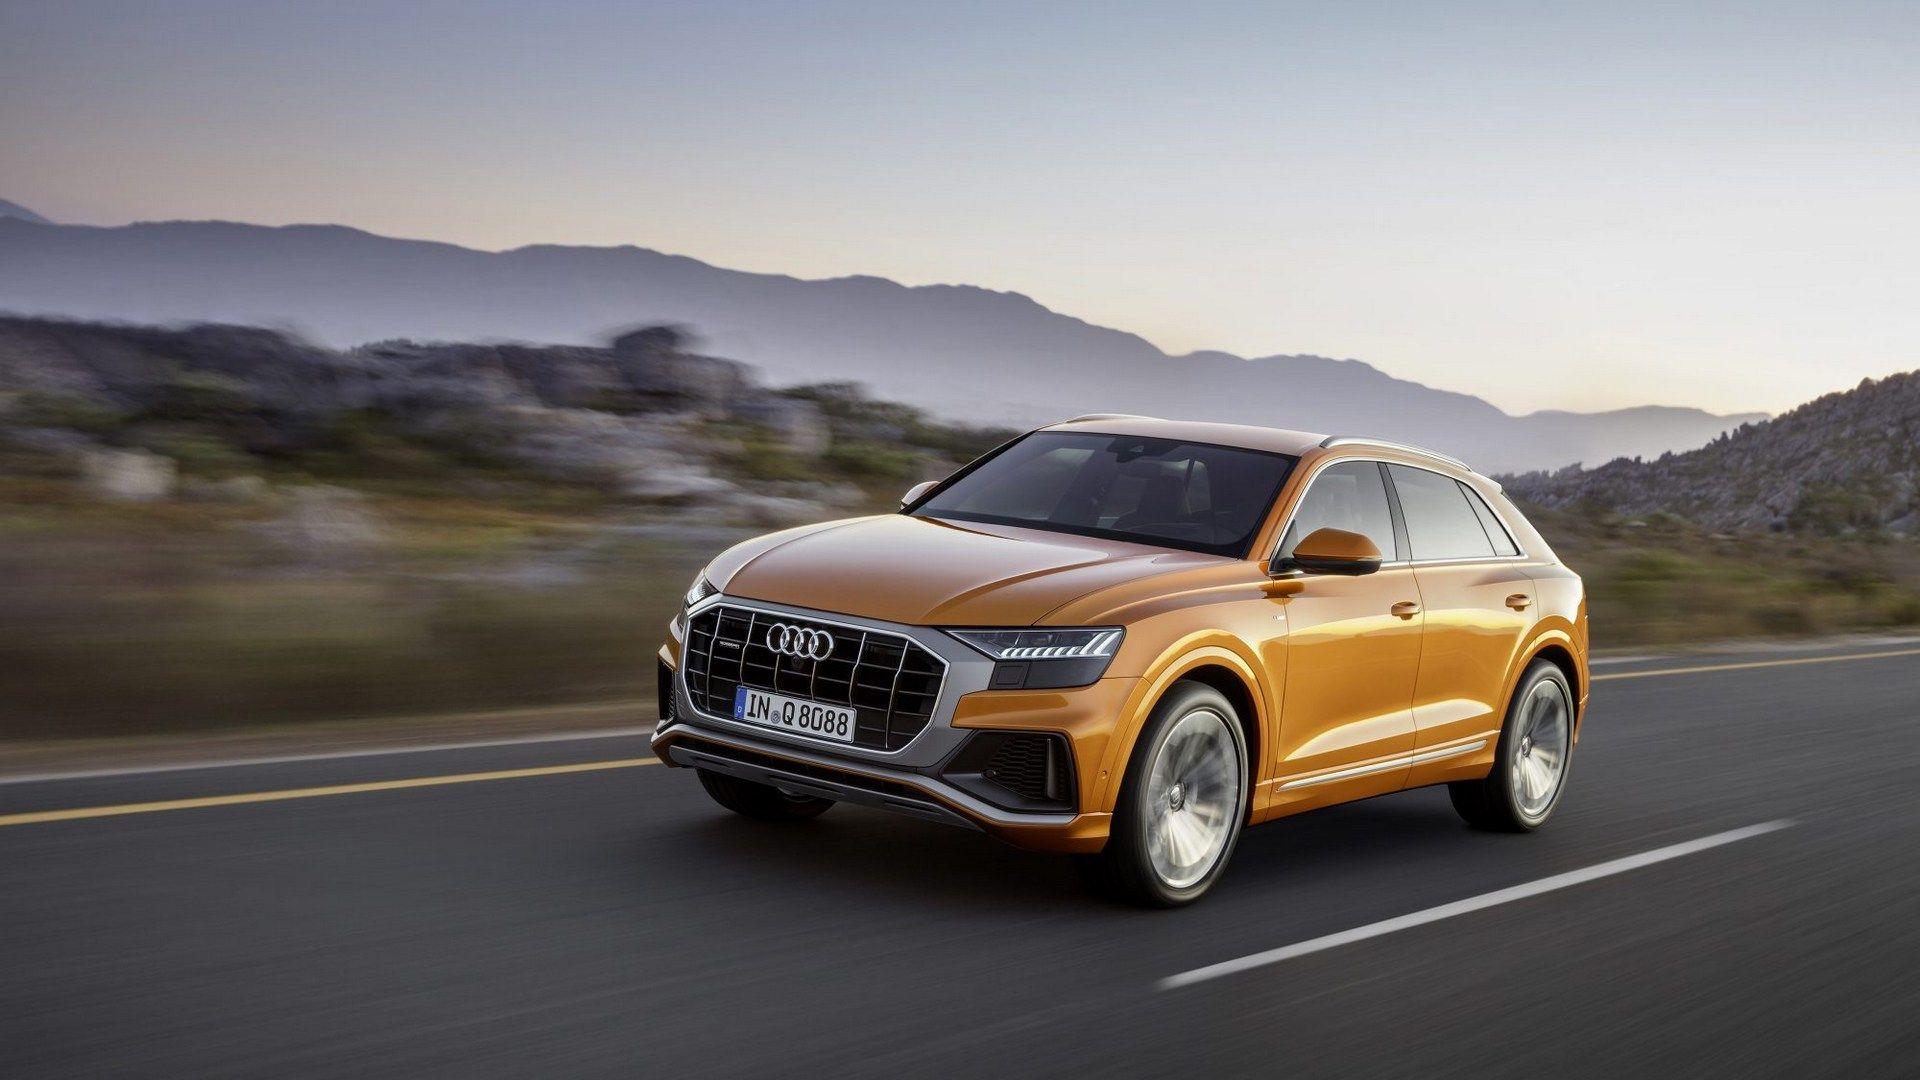 Audi Q8 2018 First Photos (2)